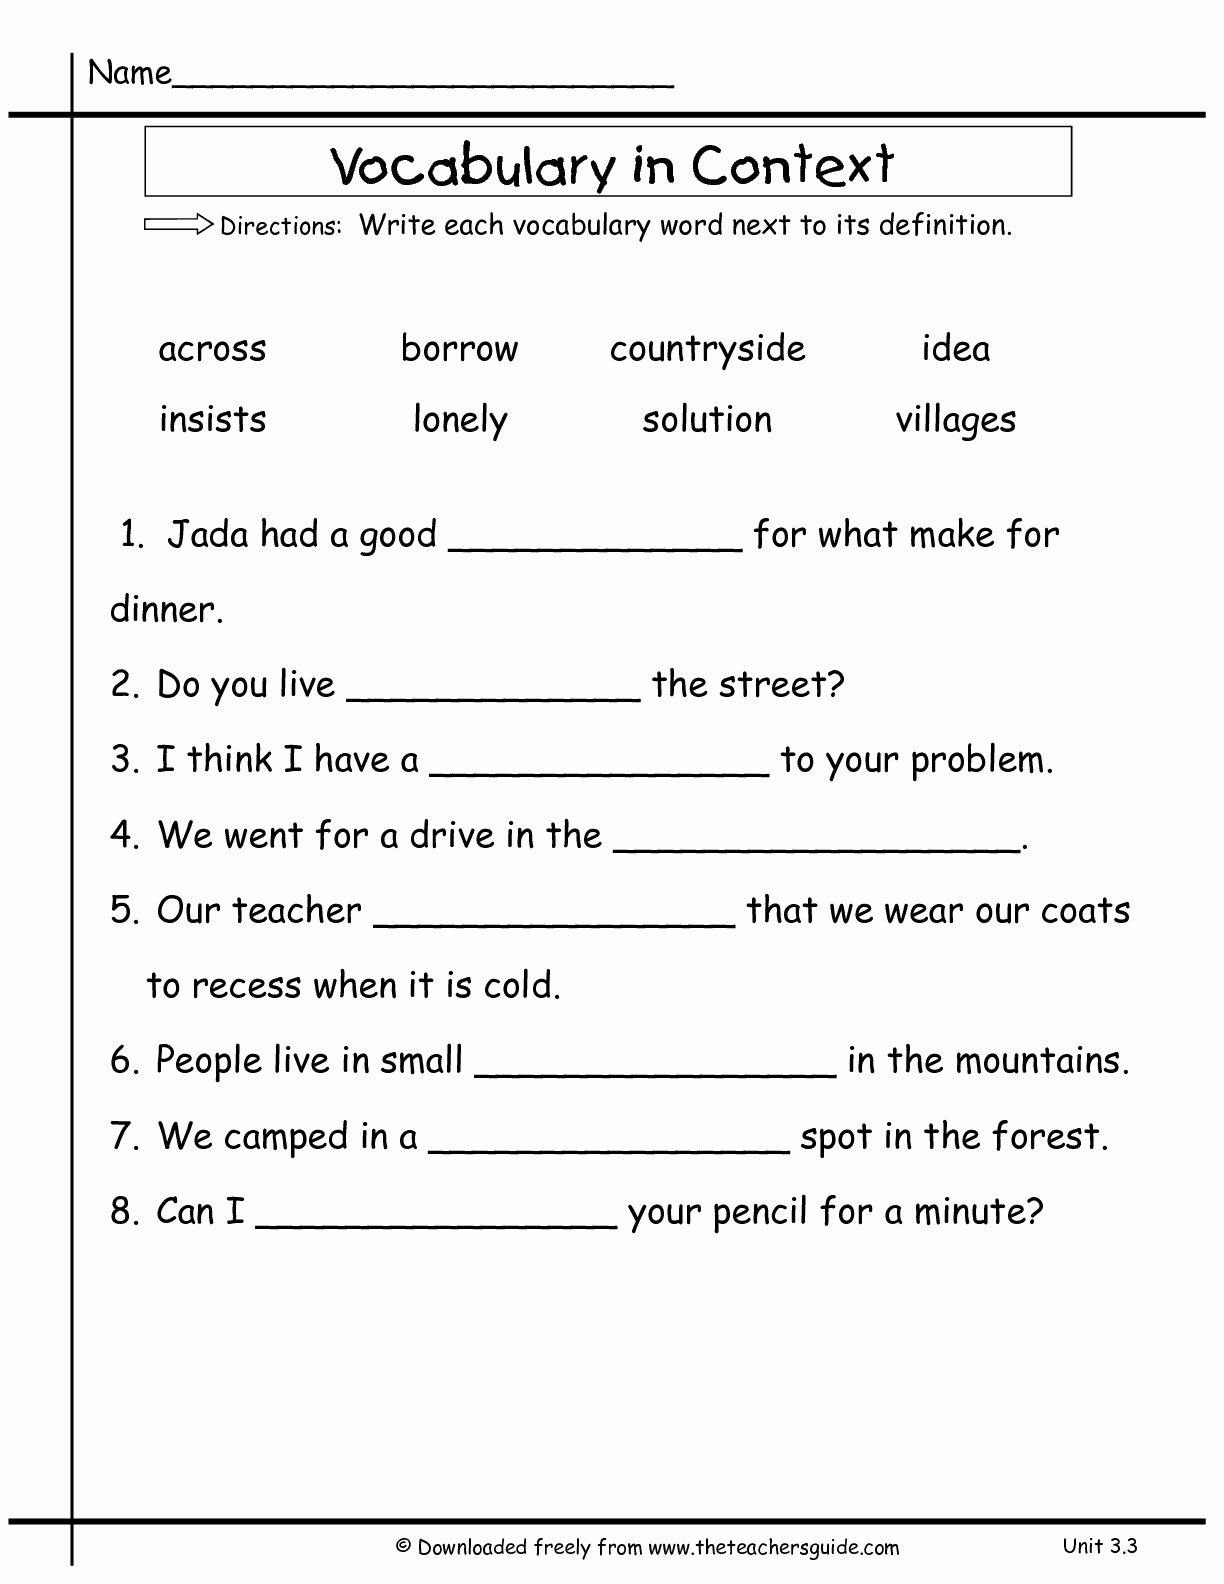 9th Grade Vocabulary Worksheet Inspirational 9th Grade Vocabulary Worksheets the Best Worksheets Image